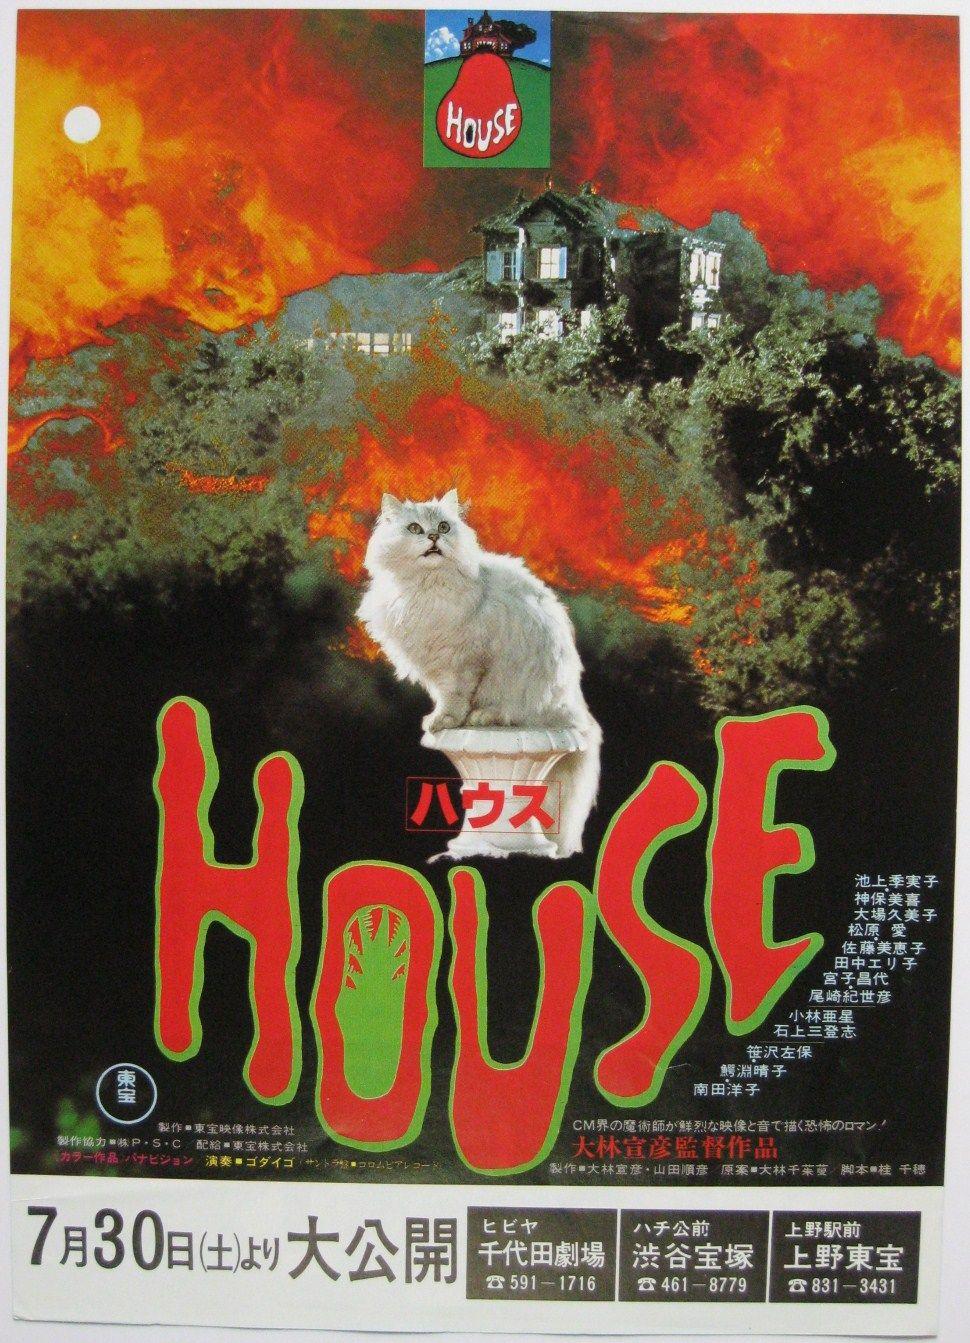 HOUSE ハウス(1977年) 日本のホラー, 日本のポスター